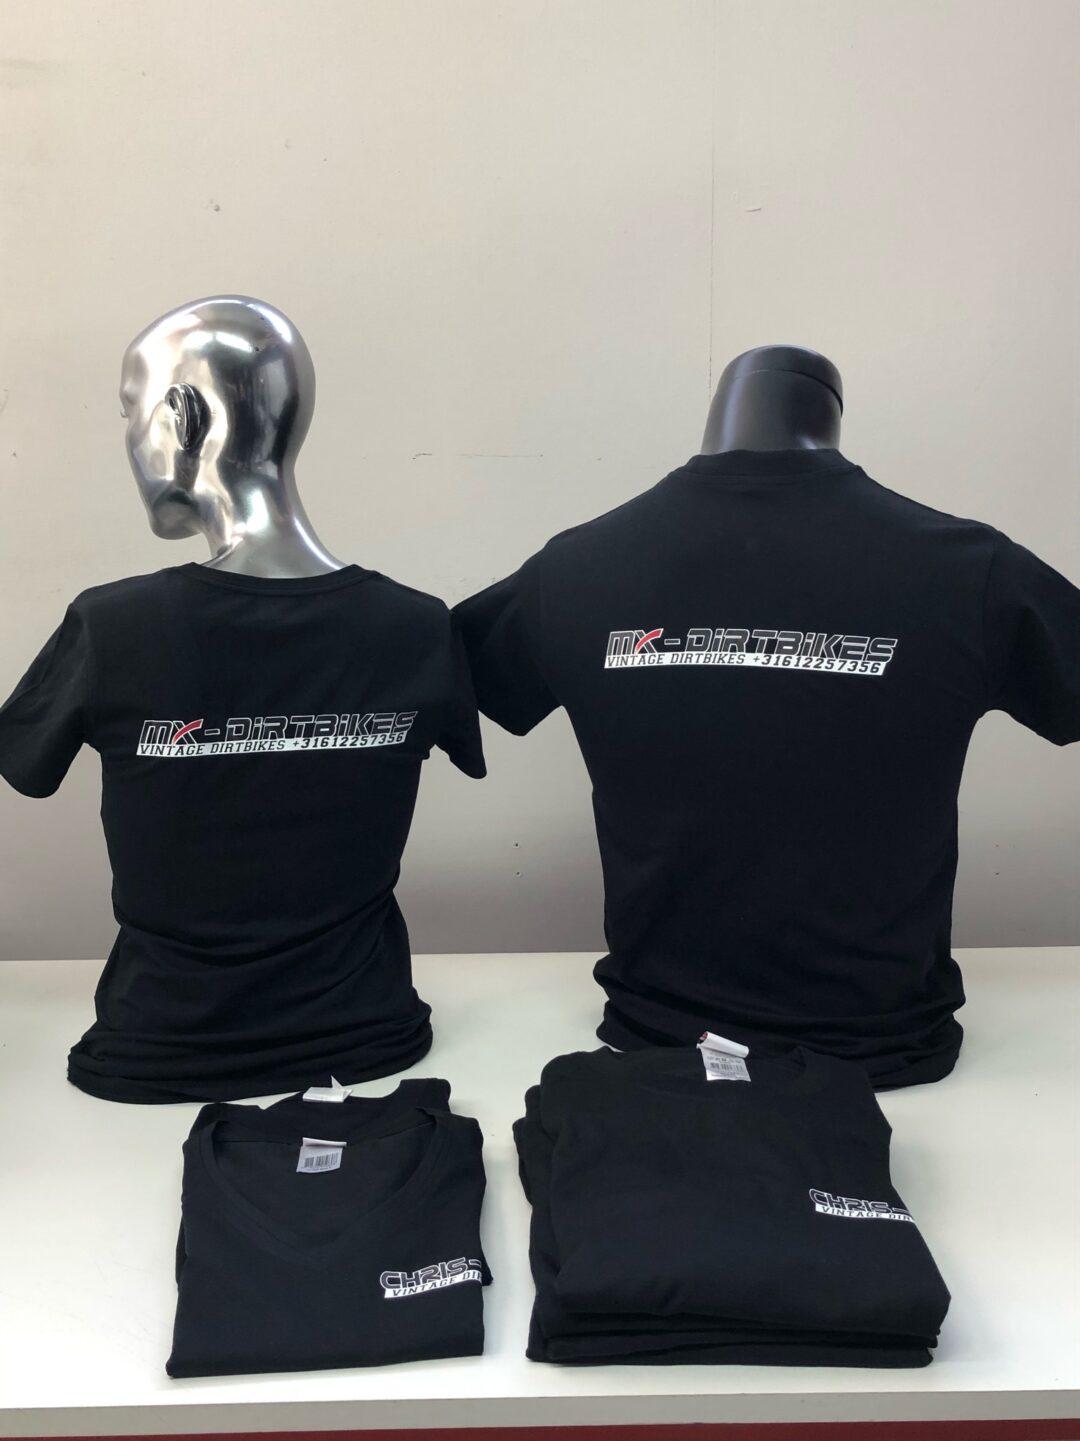 Signaal Bedrijfskleding // MX-Dirtbikes & Chris-MX // Diverse kleding voorzien van Full Colour borst- en ruglogos